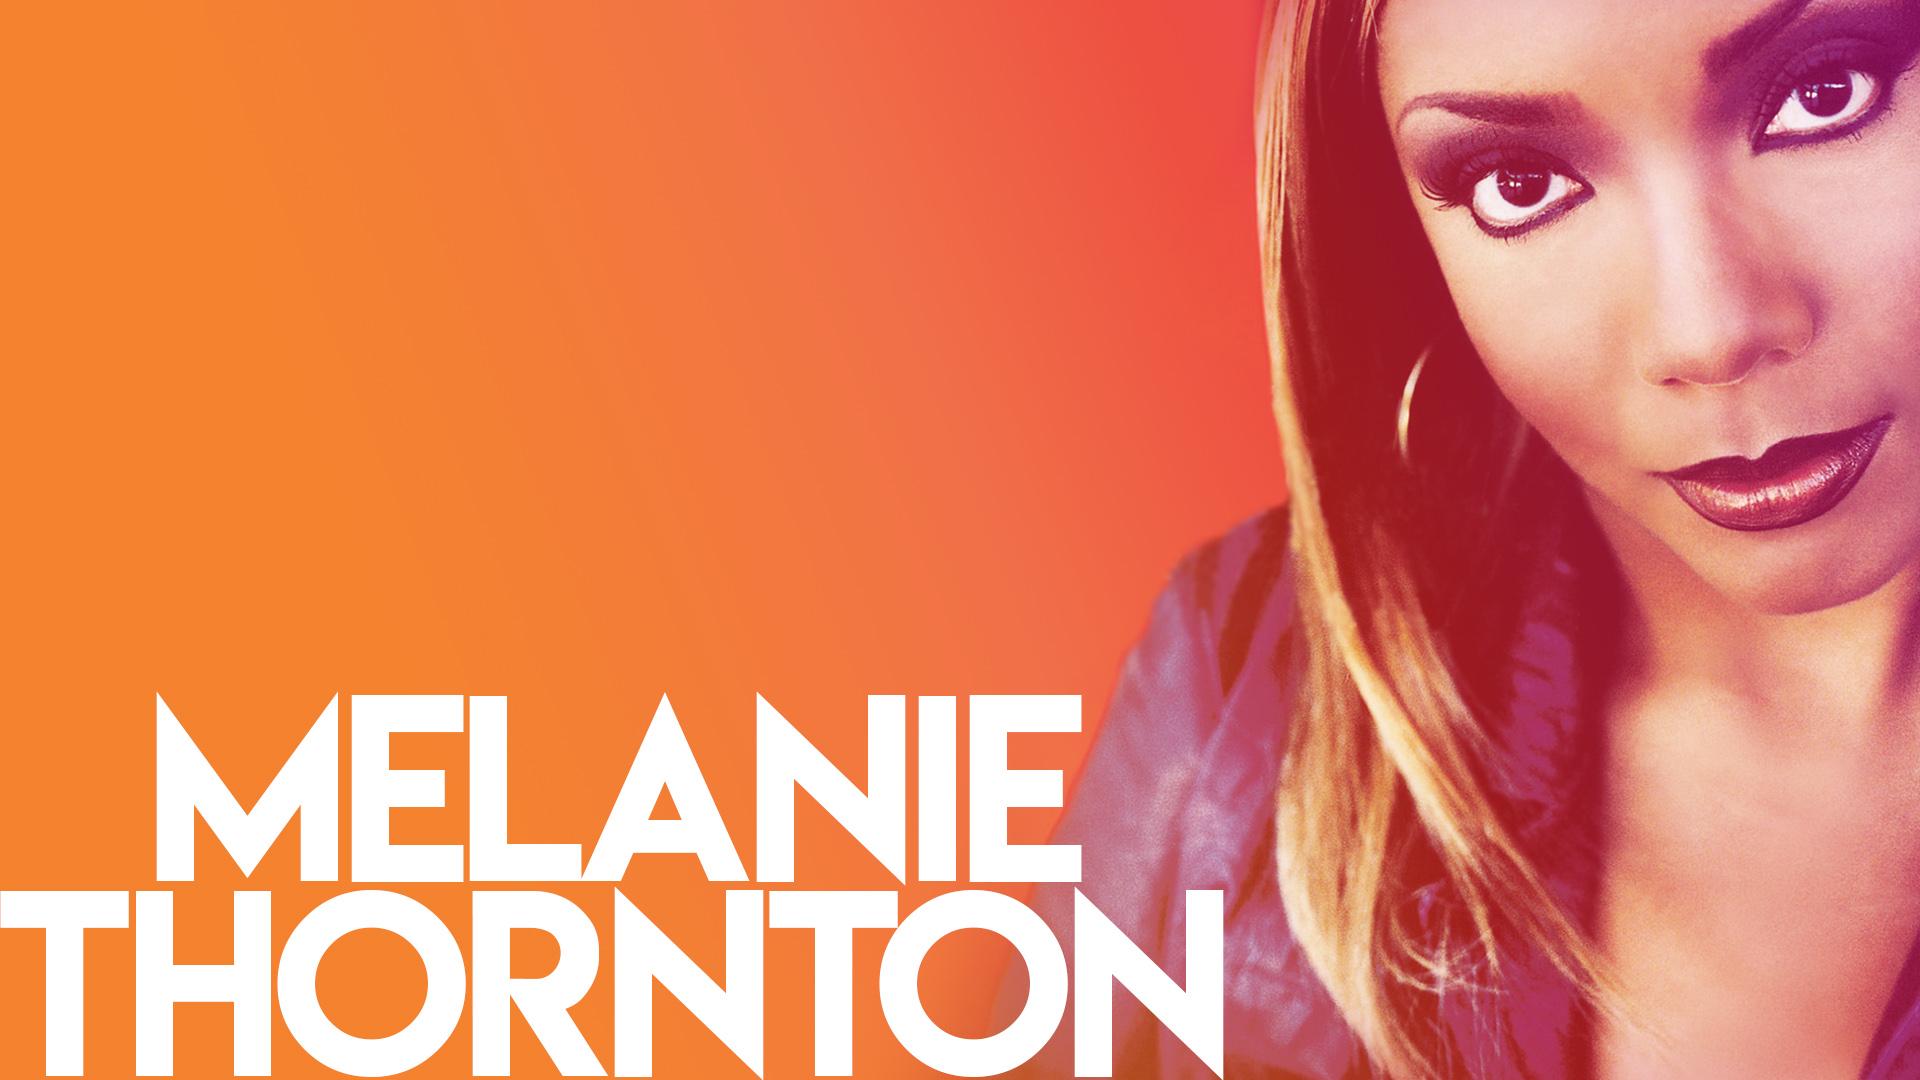 Melanie thornton